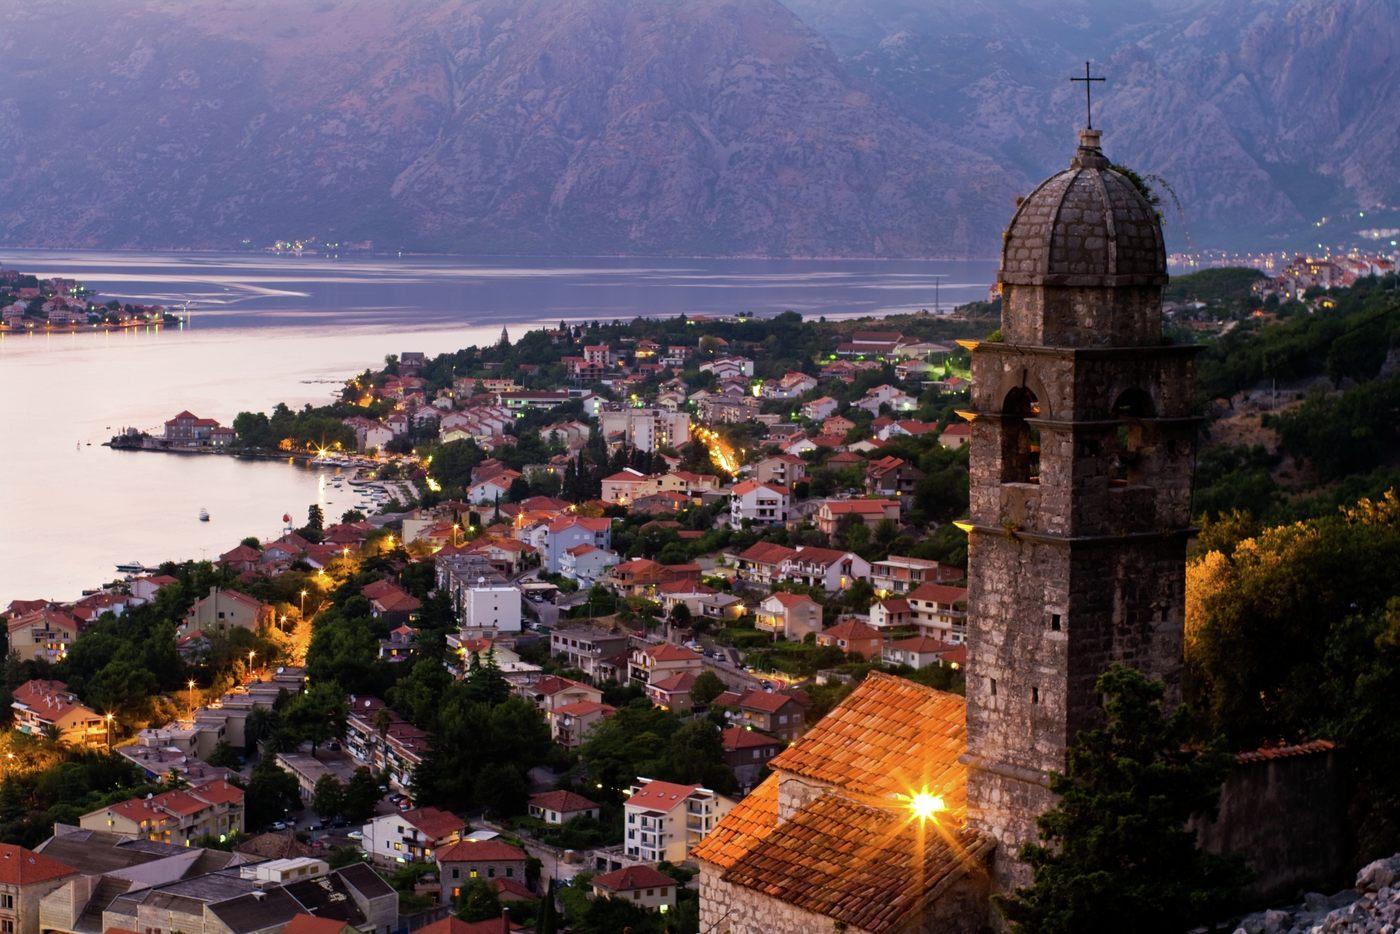 Walking through the stunning entrance to Old Town Budva in Montenegro